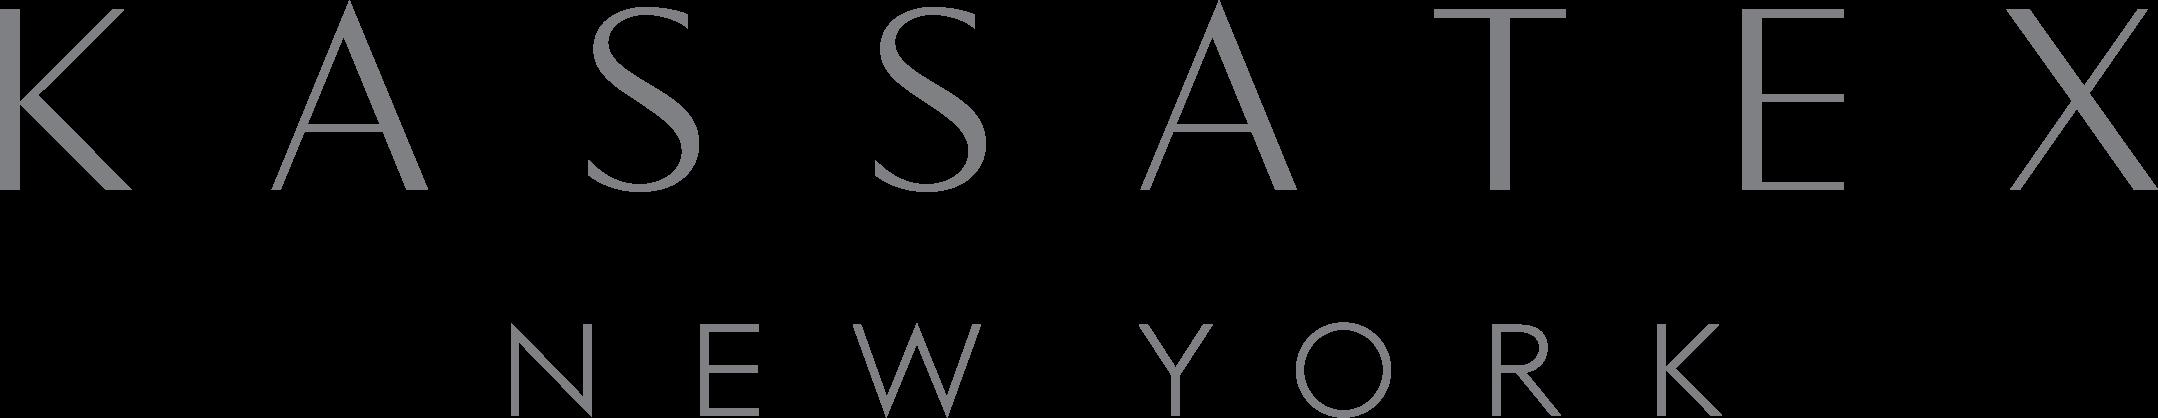 Kassatex Logo